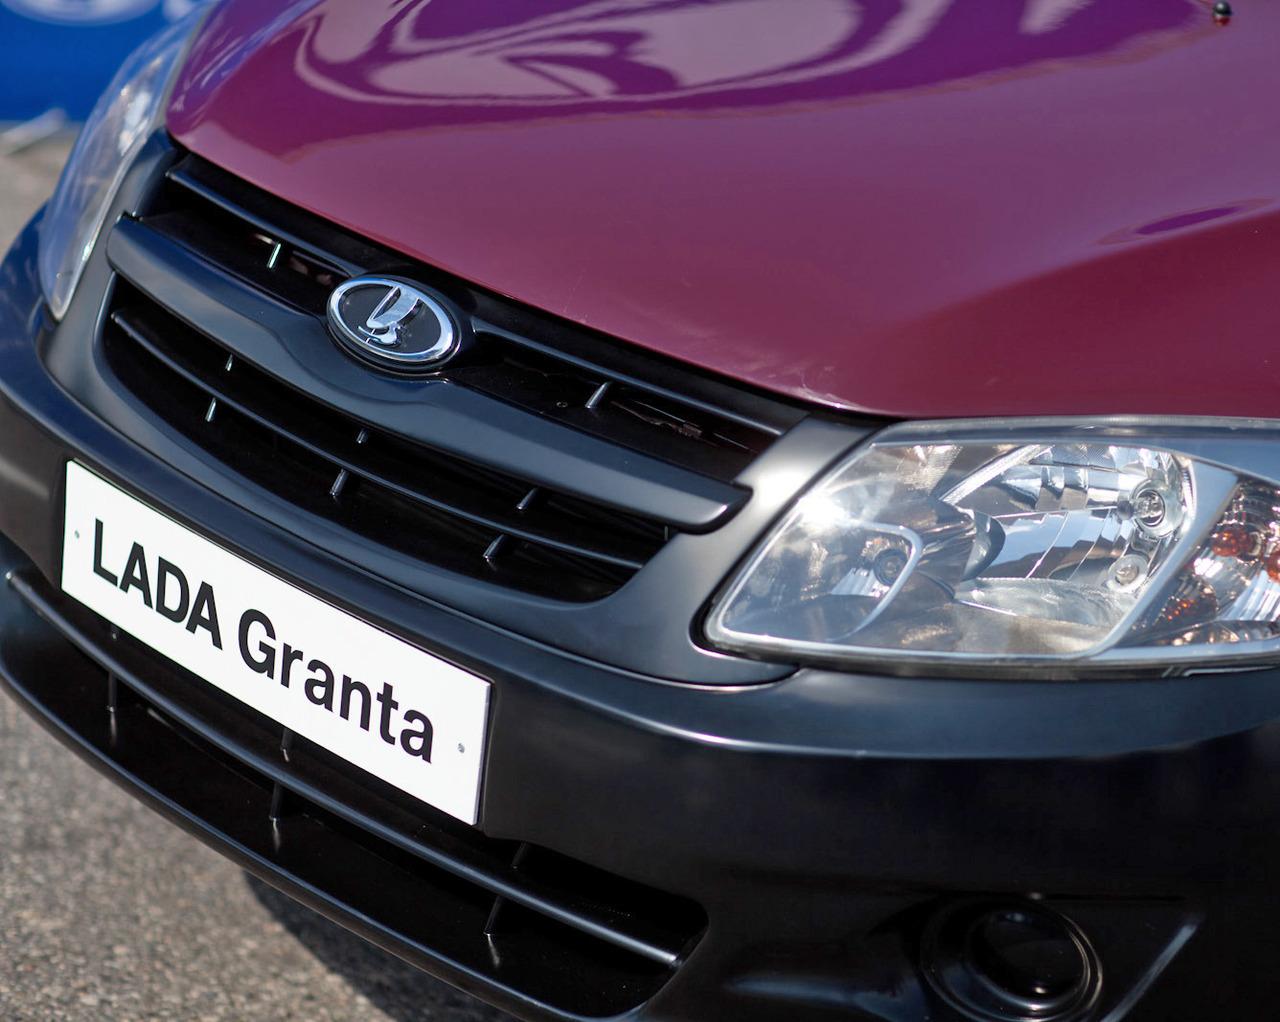 У Путина незаLADилось с новой Lada Granta (29 фото + 3 видео) .